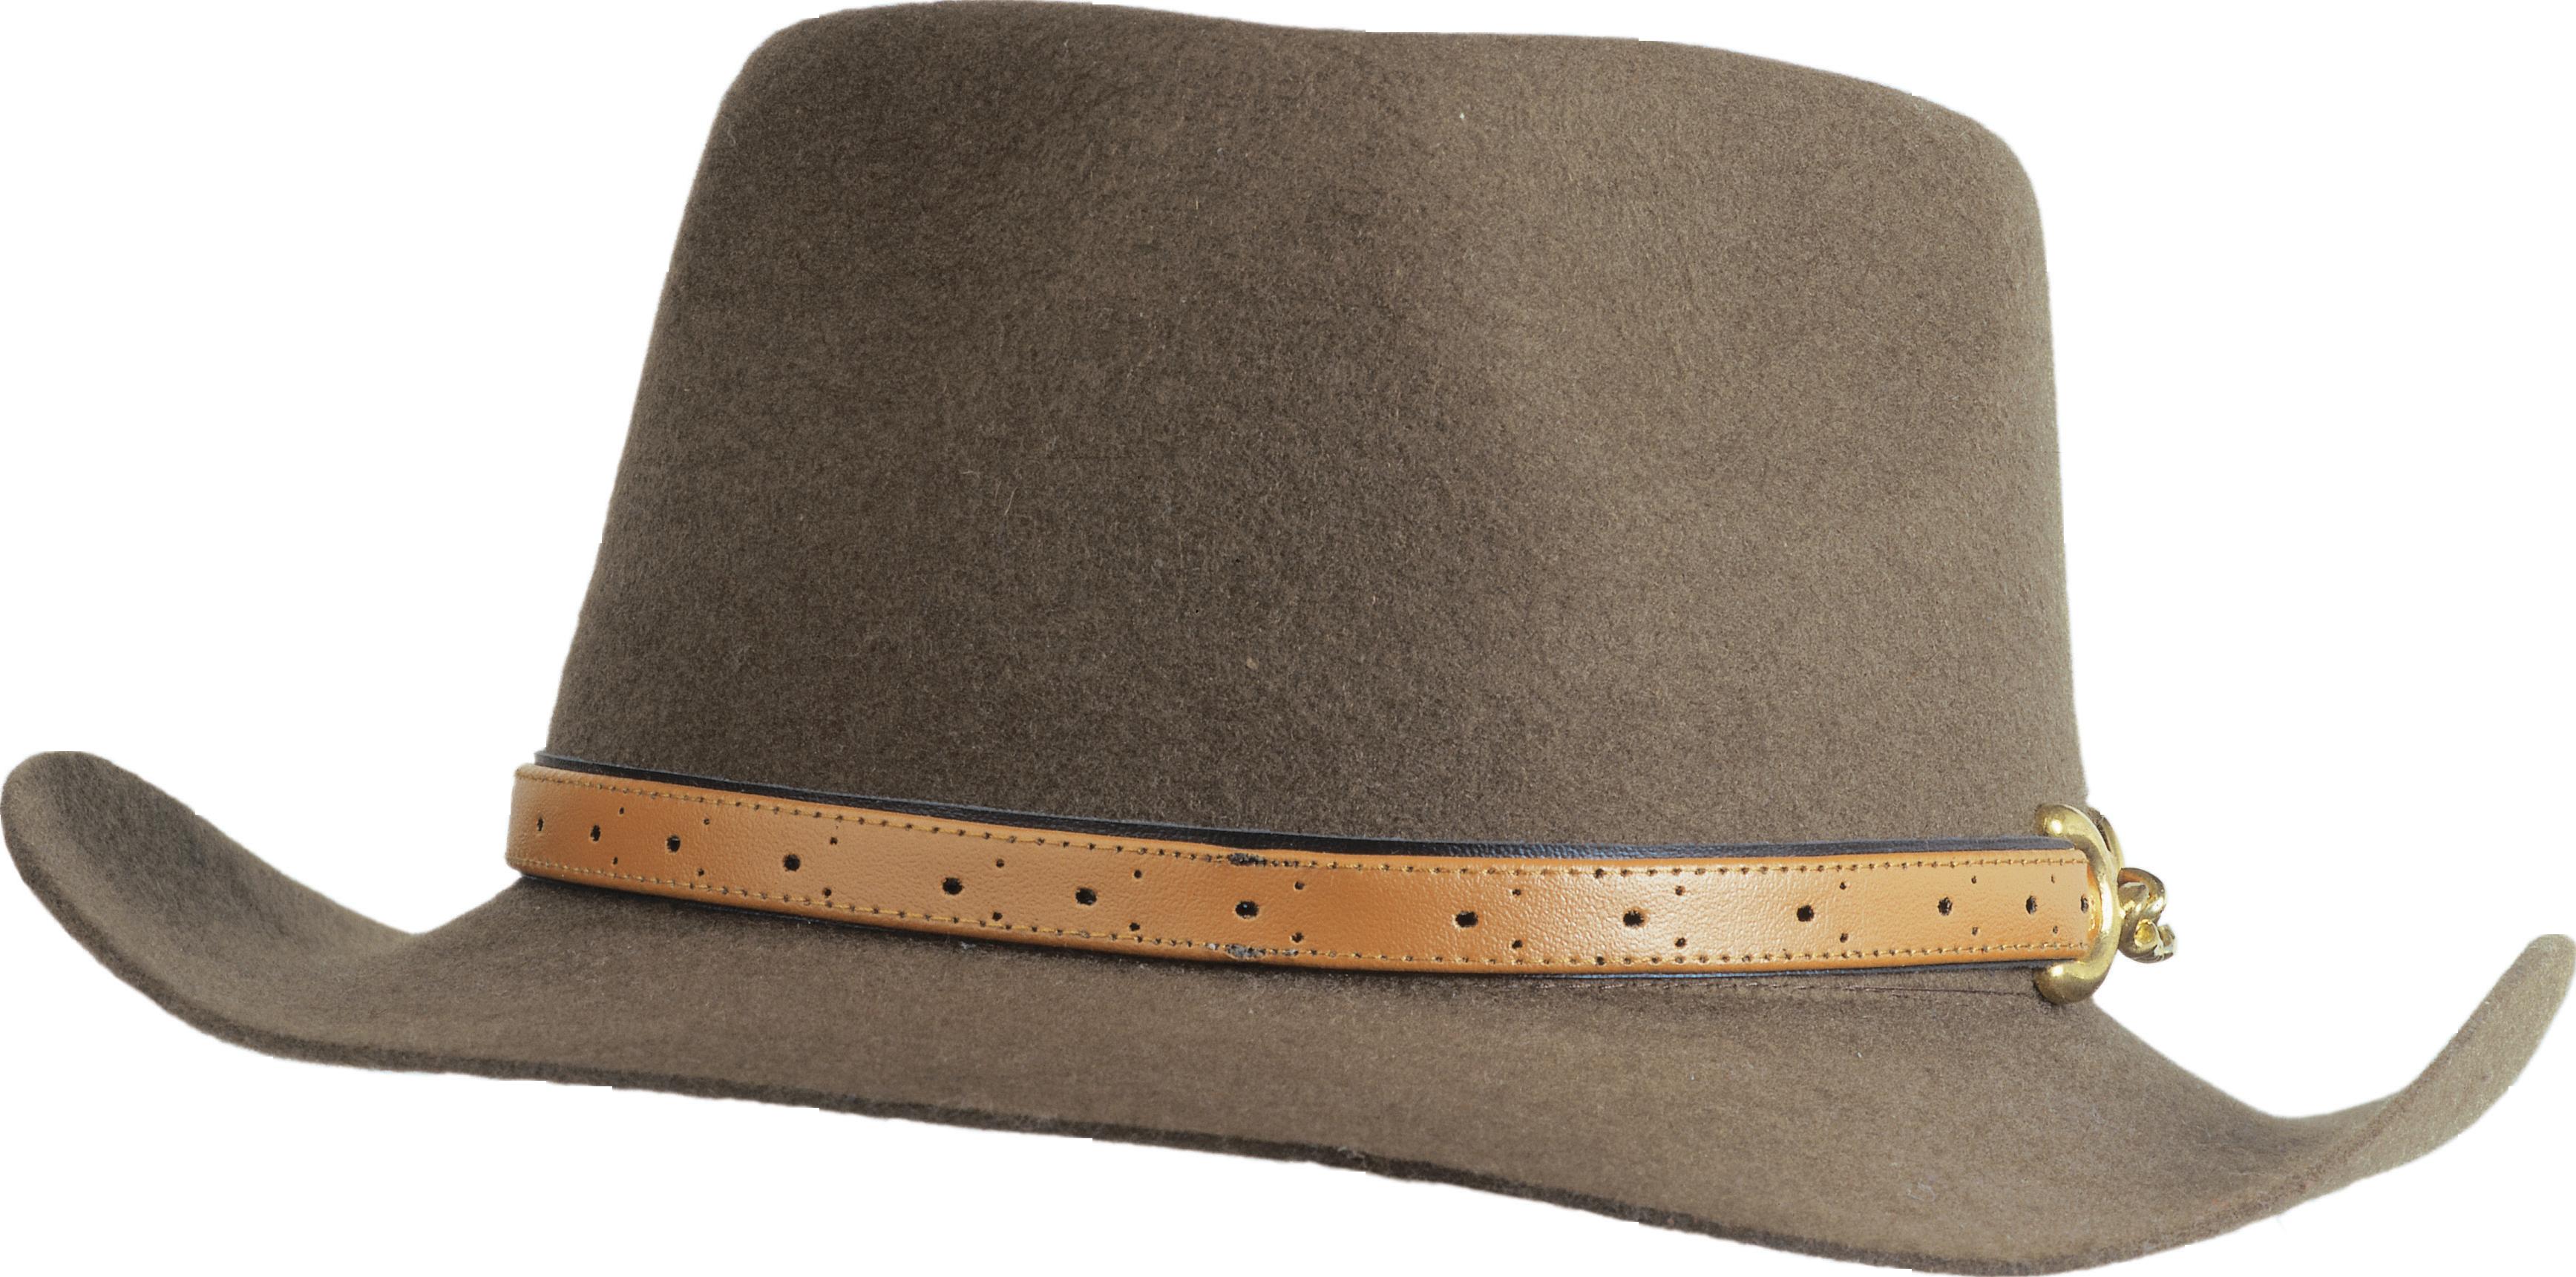 Nice Hat PNG Image.